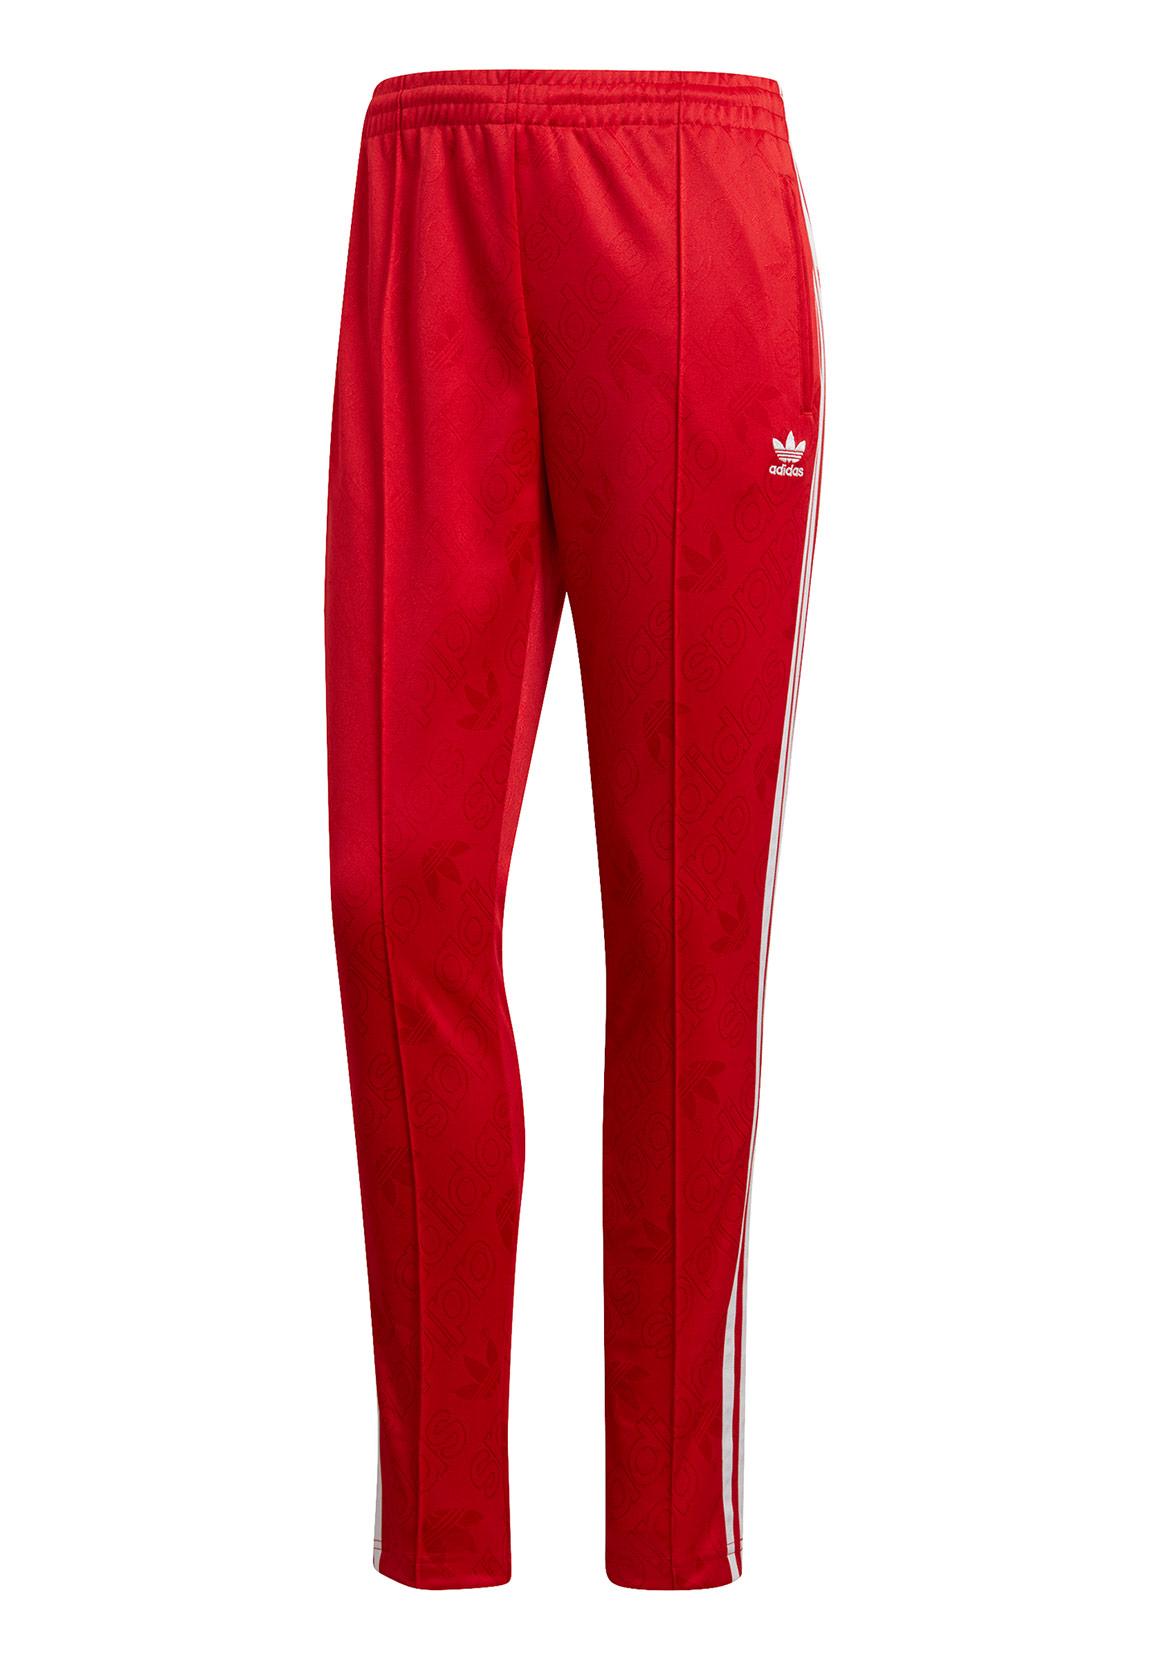 uk billig verkaufen 100% original klassische Schuhe Adidas Originals Jogginghose Damen SS TP ED7462 Rot